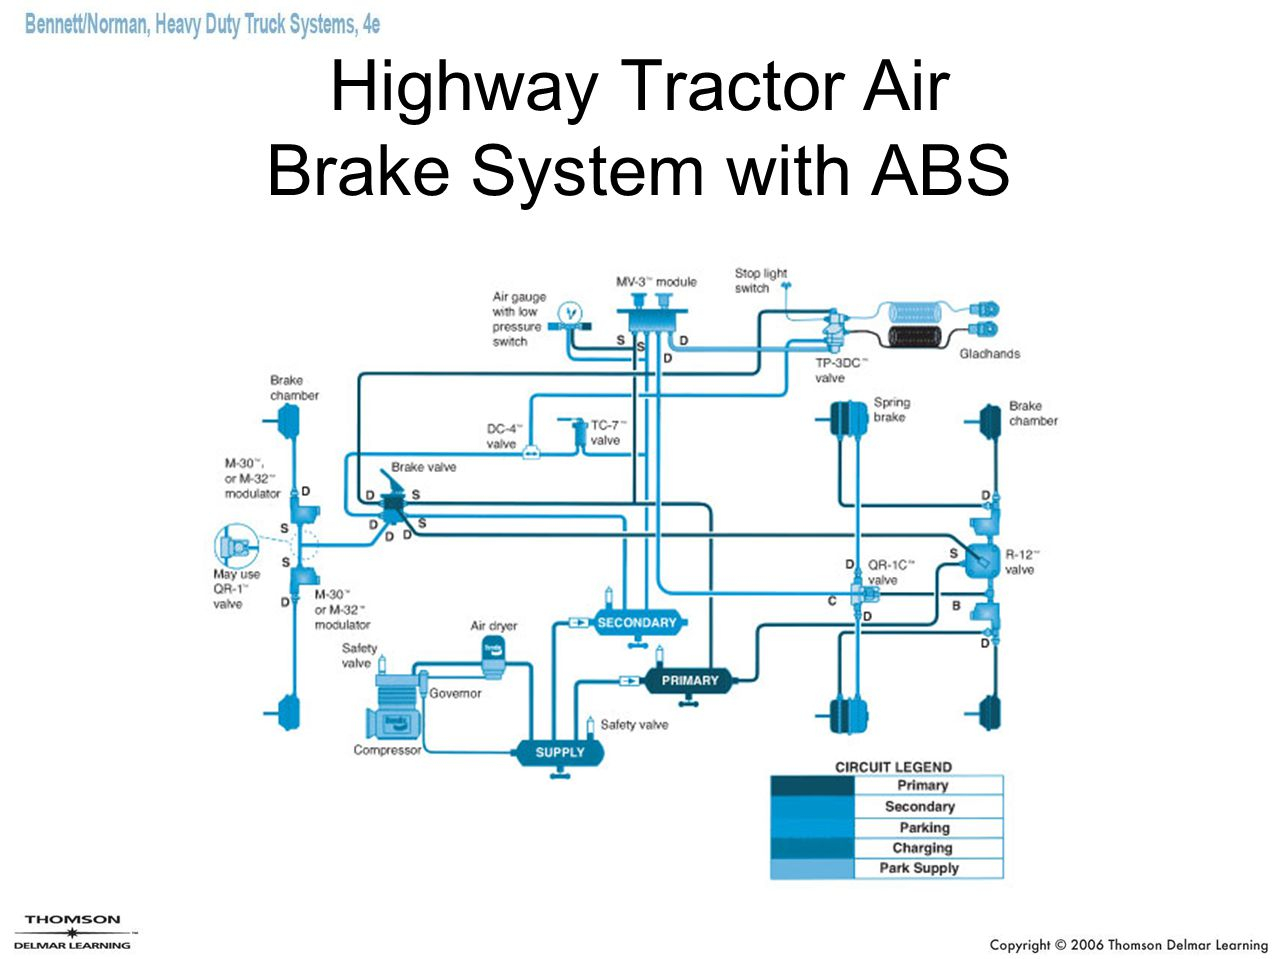 Air Brake Foot Valve Diagram Chapter 28 Truck Brake Systems Ppt Video Online Download